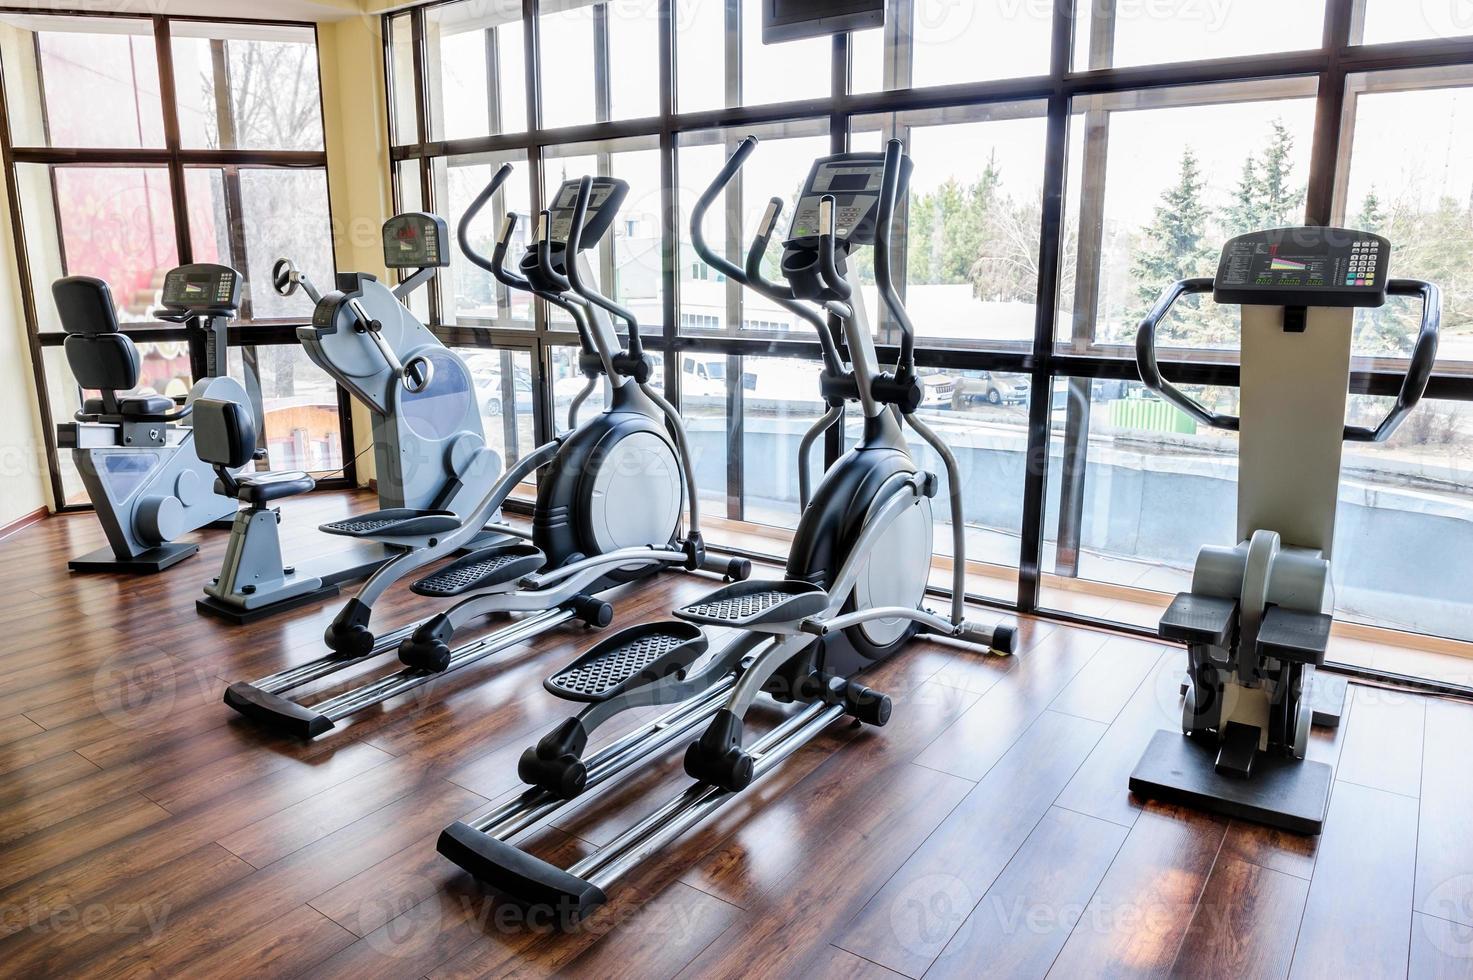 Gym interior with many treadmill machines photo